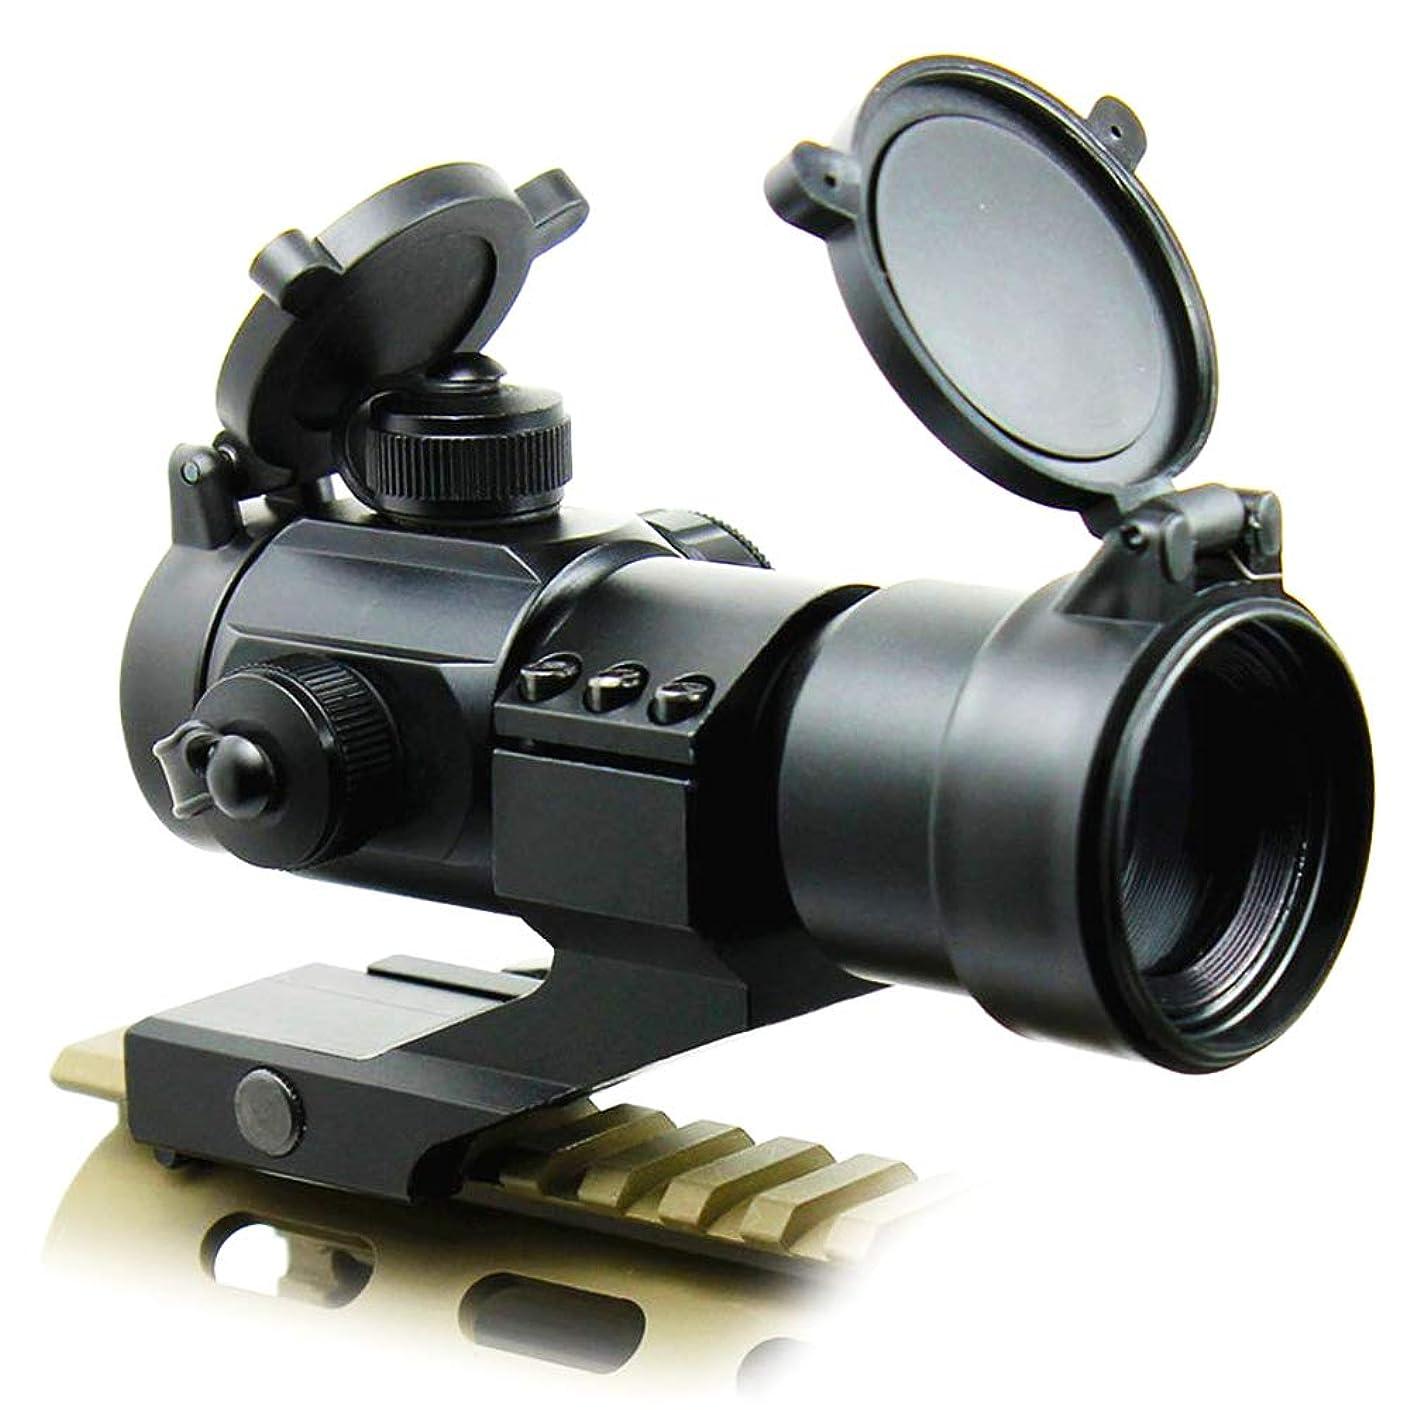 Hauska Tactical Red Green Dot Sight Reflex Holographic Scope Picatinny Mount Co-Witness Iron Sight Integretad Flip Lens Up Lens Caps